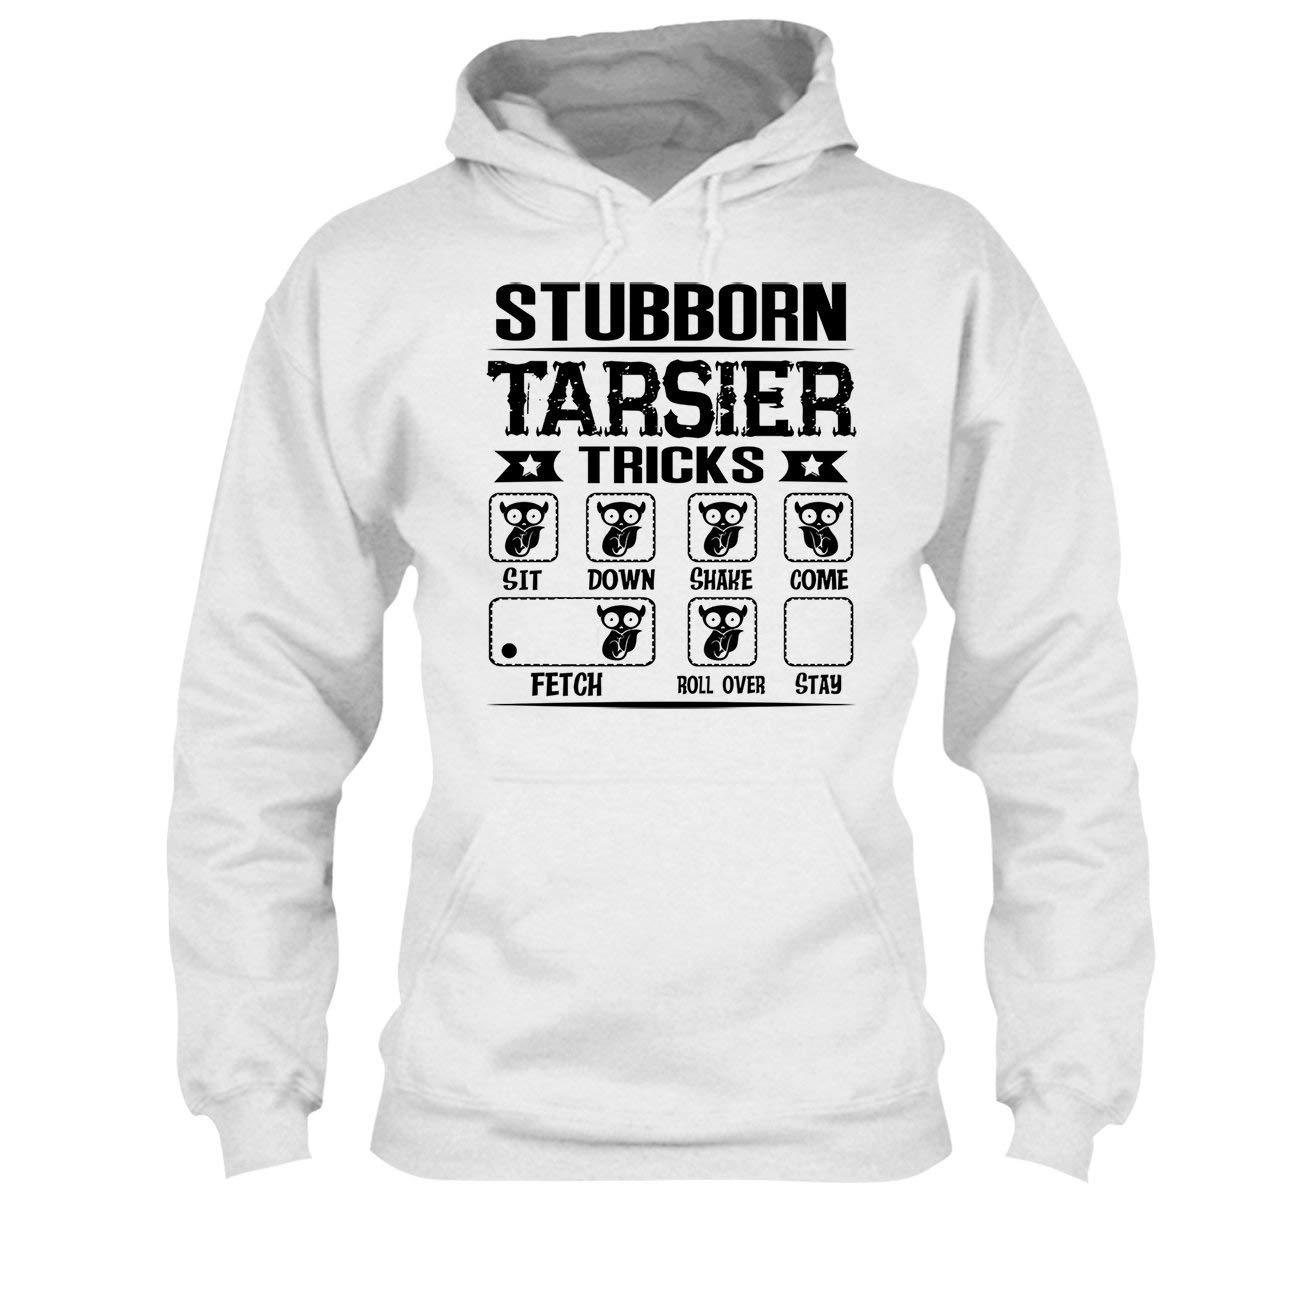 Shirt Light Orange Stubborn Tarsier Tricks Tee Shirt Hoodies